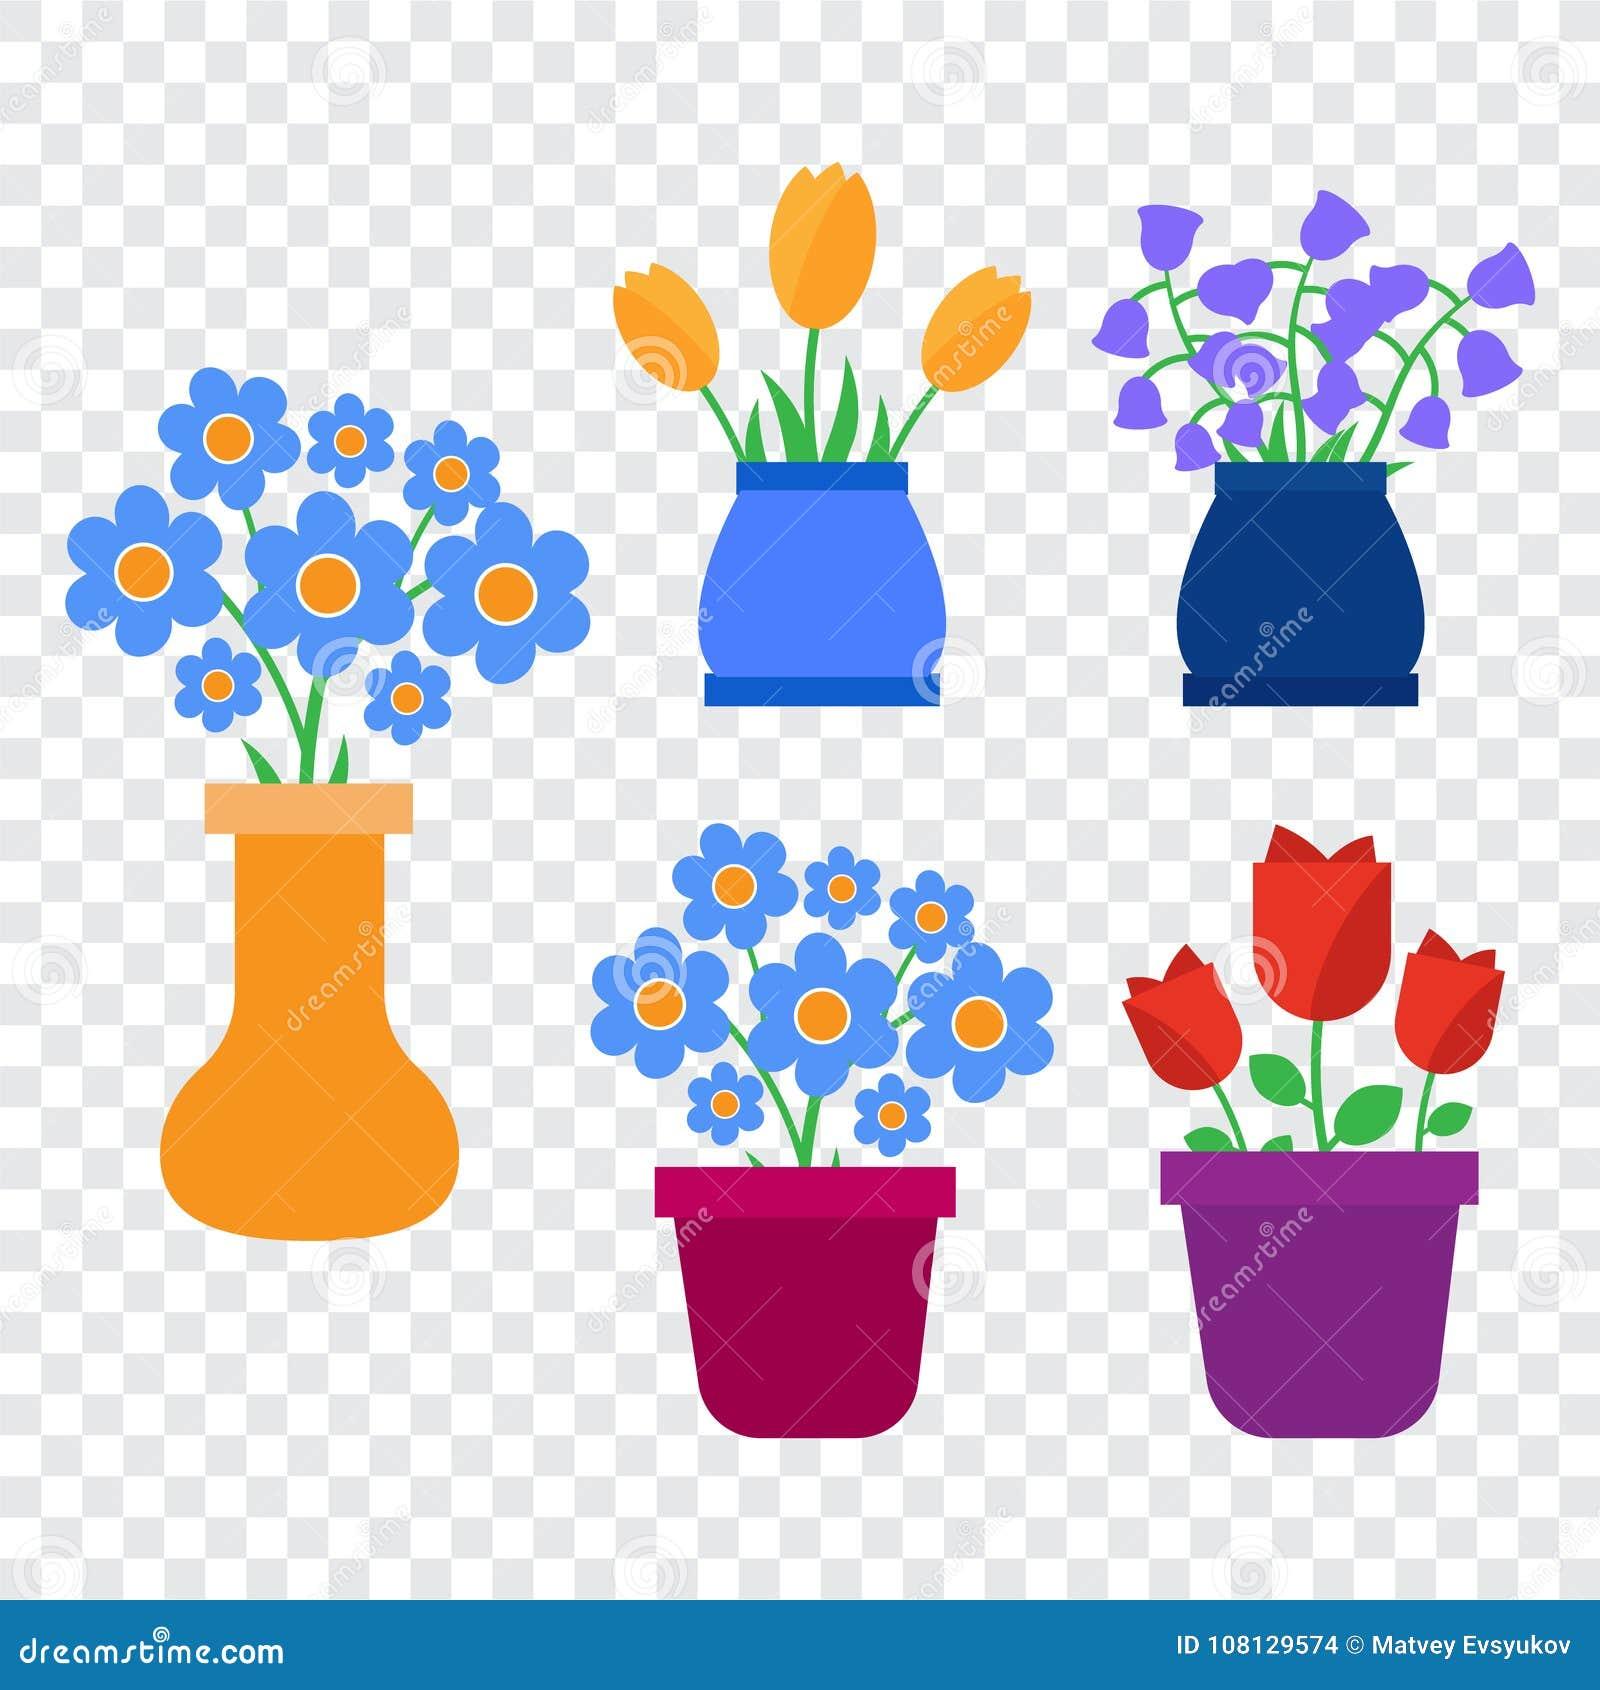 Spring Flowers Cute Vector Spring Flowers Icons Simple Flowers